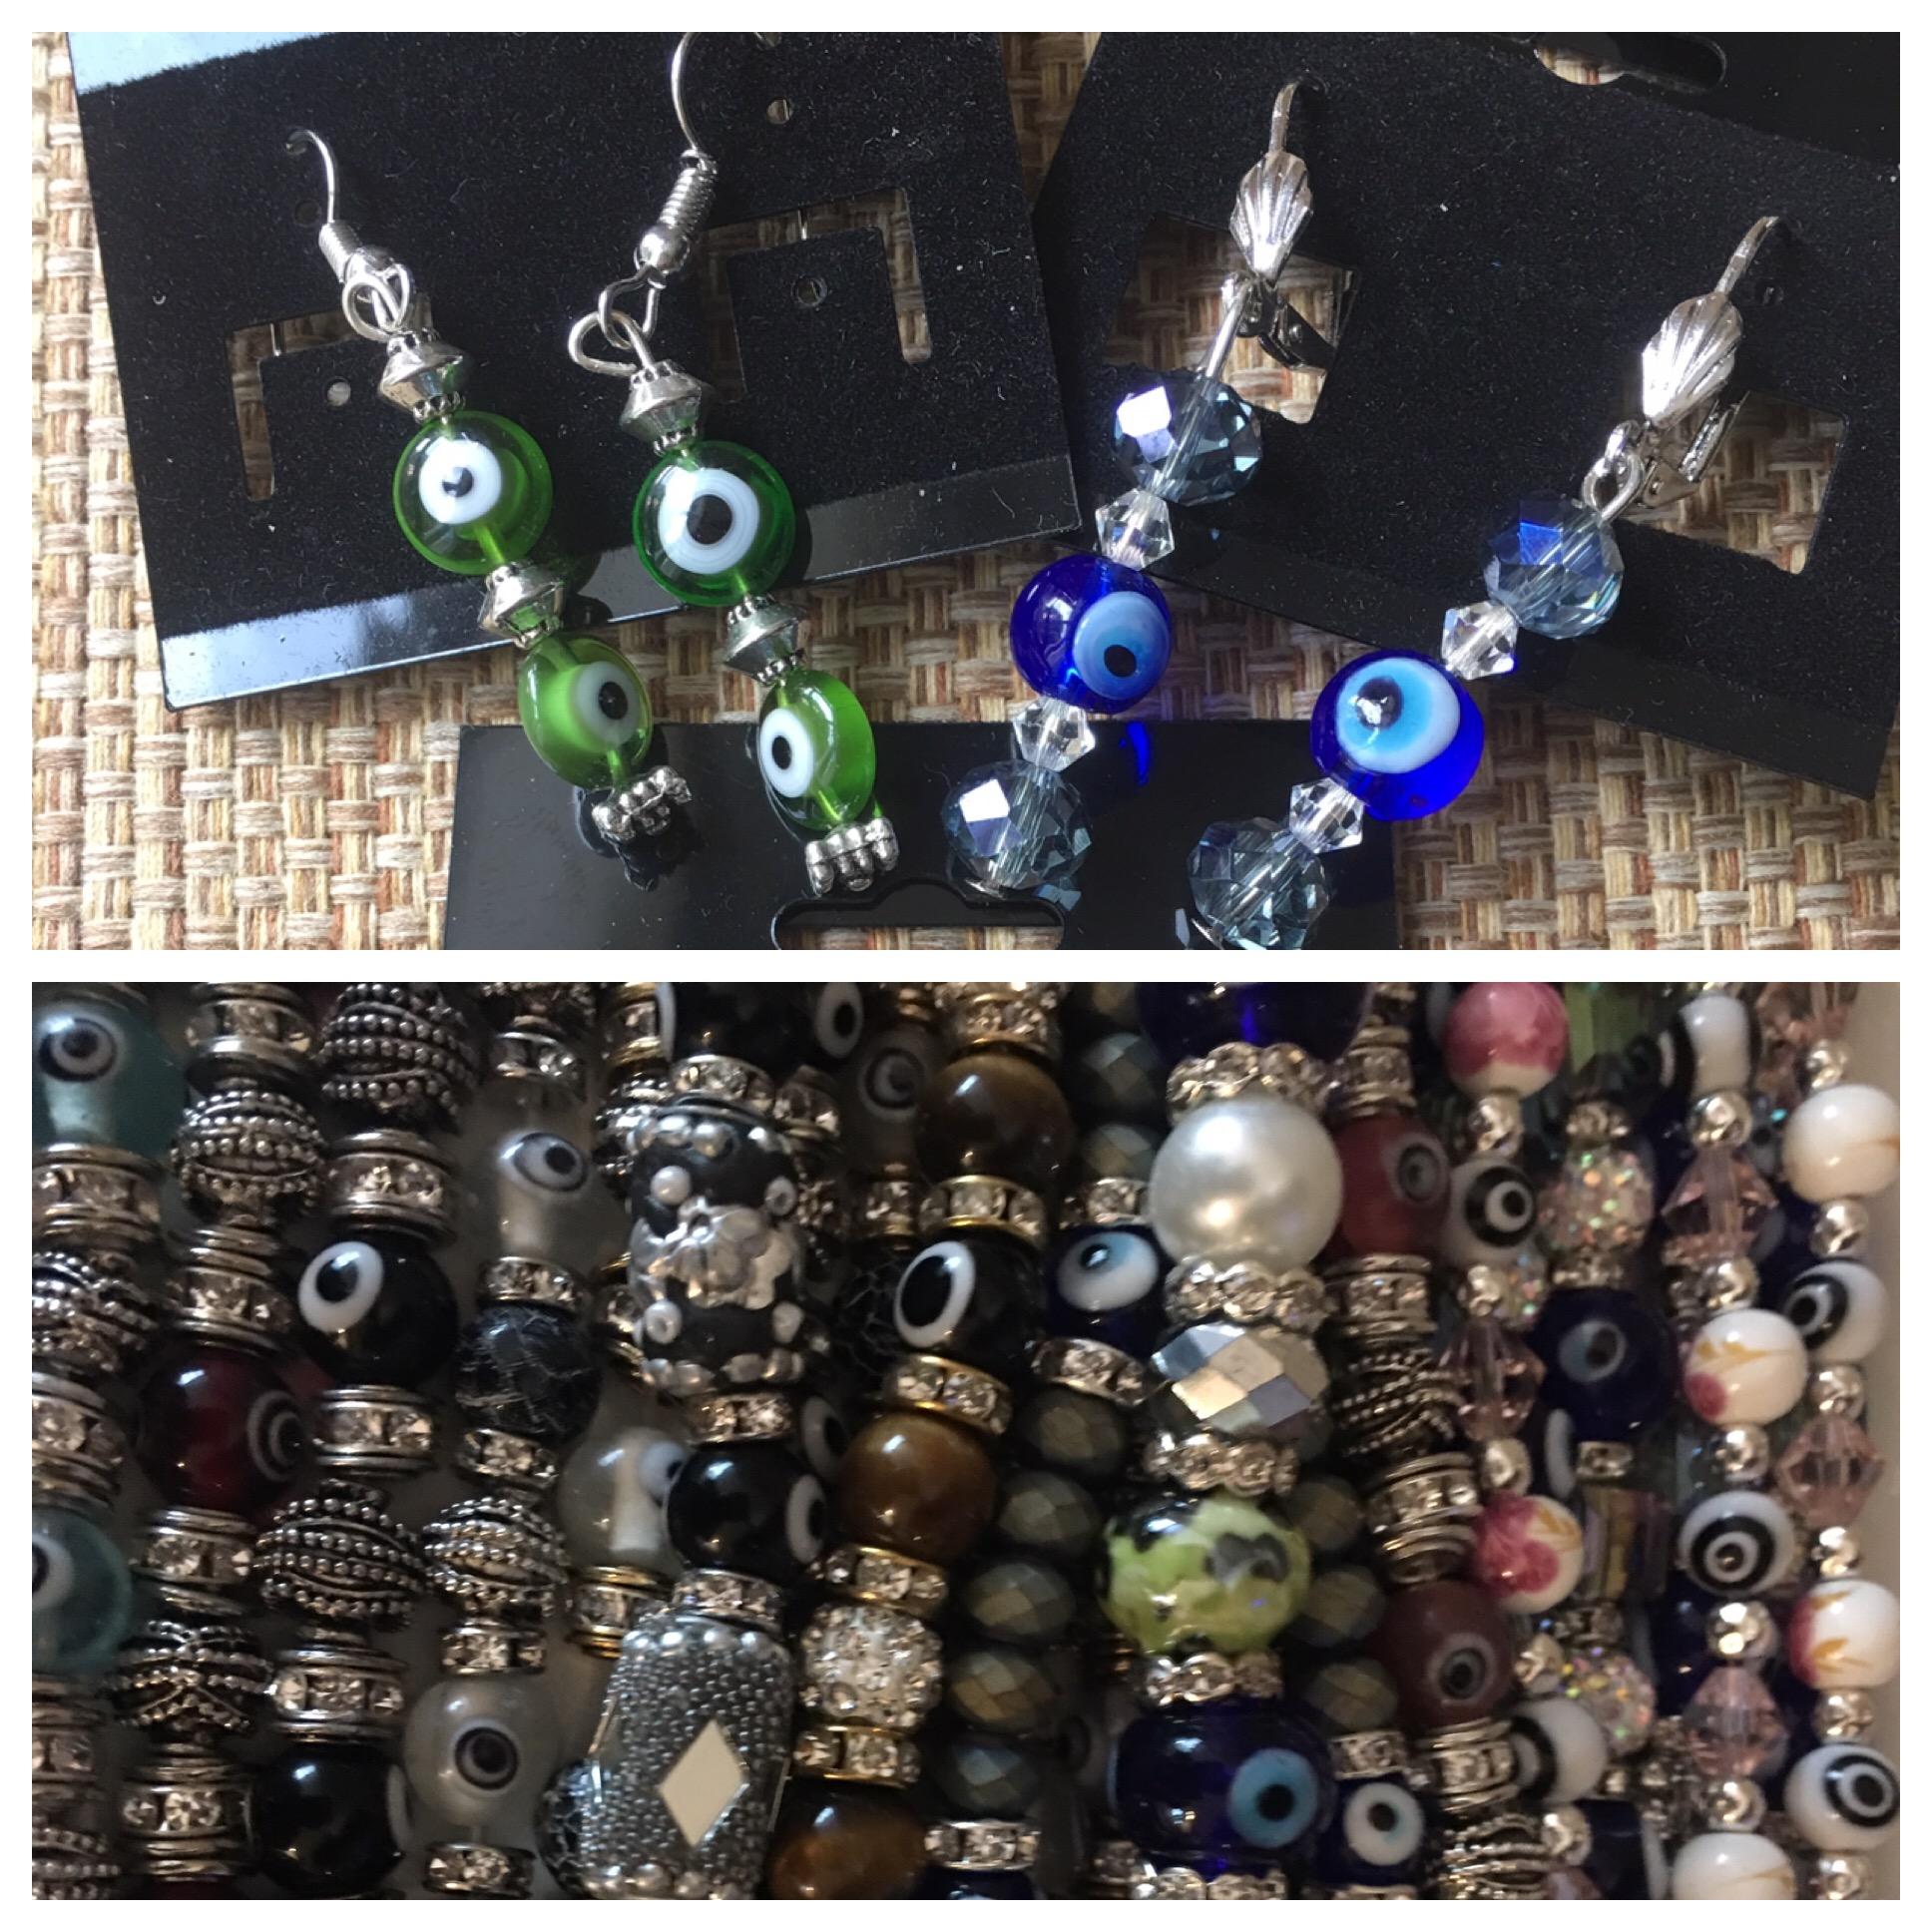 Jewelry Making - Instructor: Val KoenDate: Saturday, Sept. 7, 1:00-4:00 (Half Day Class)Cost: $50Maximum: 6 spotsNo Experience Necessary